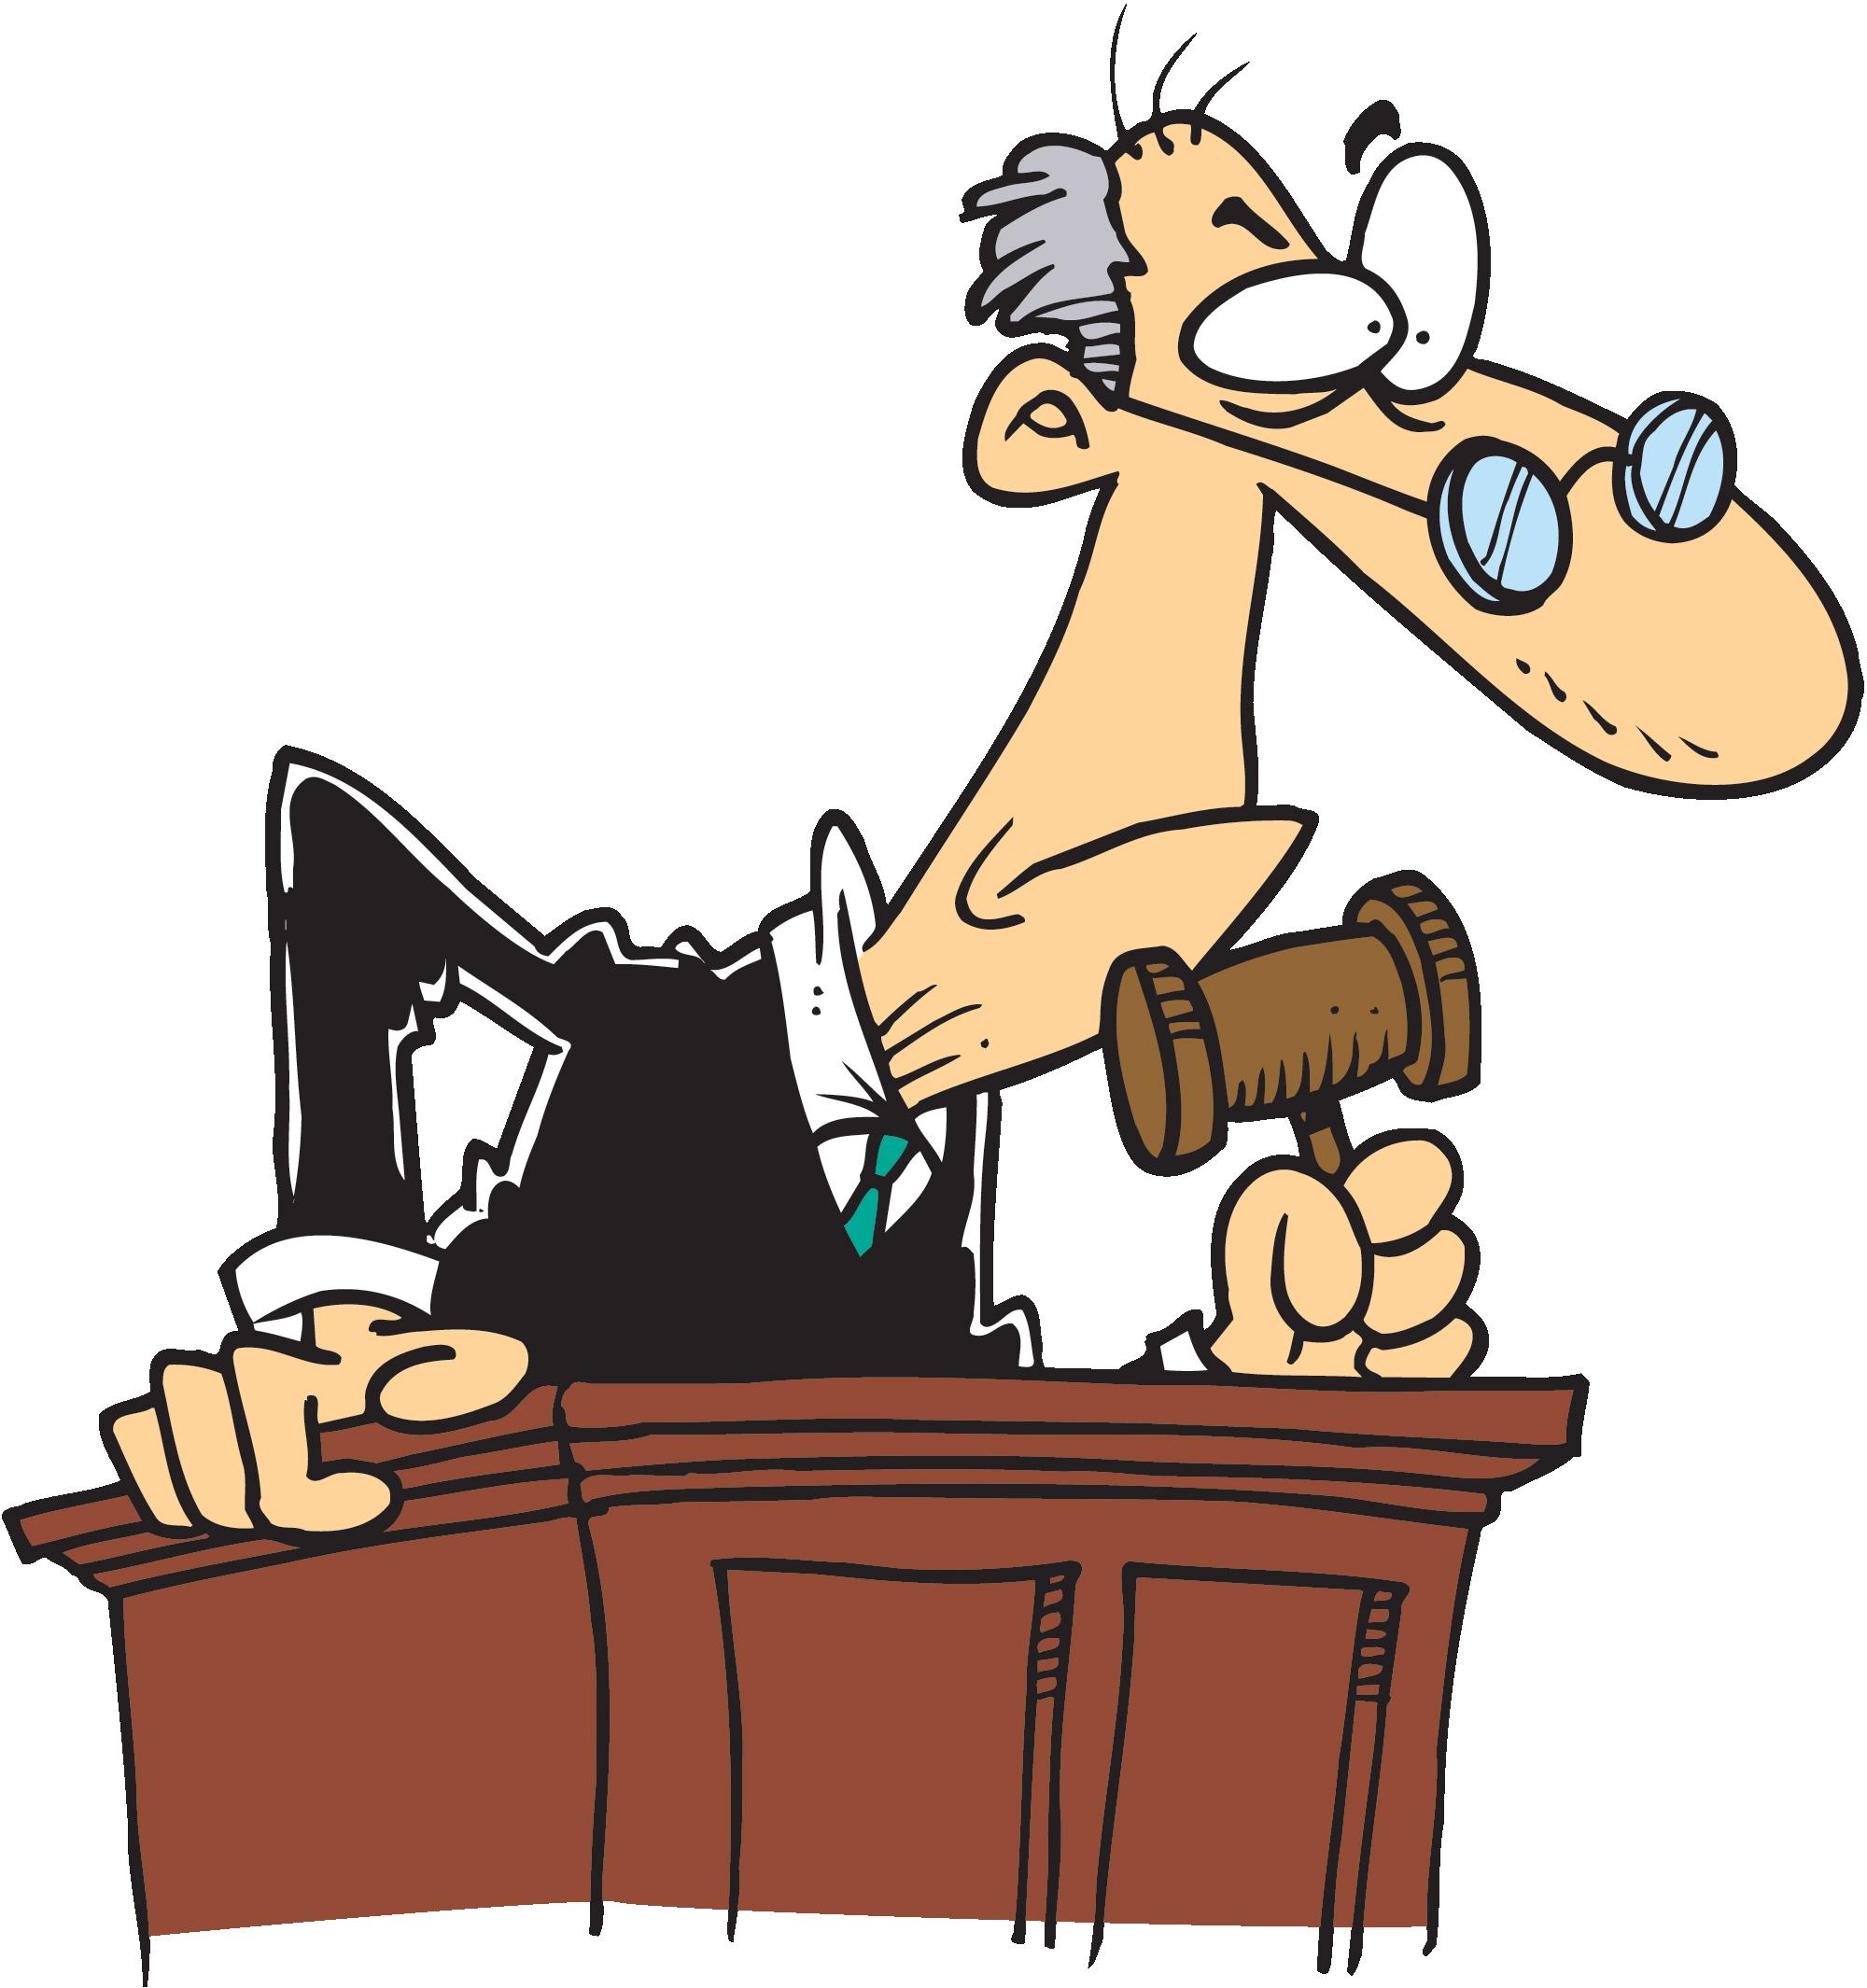 Clipart Judge - Cliparts.co